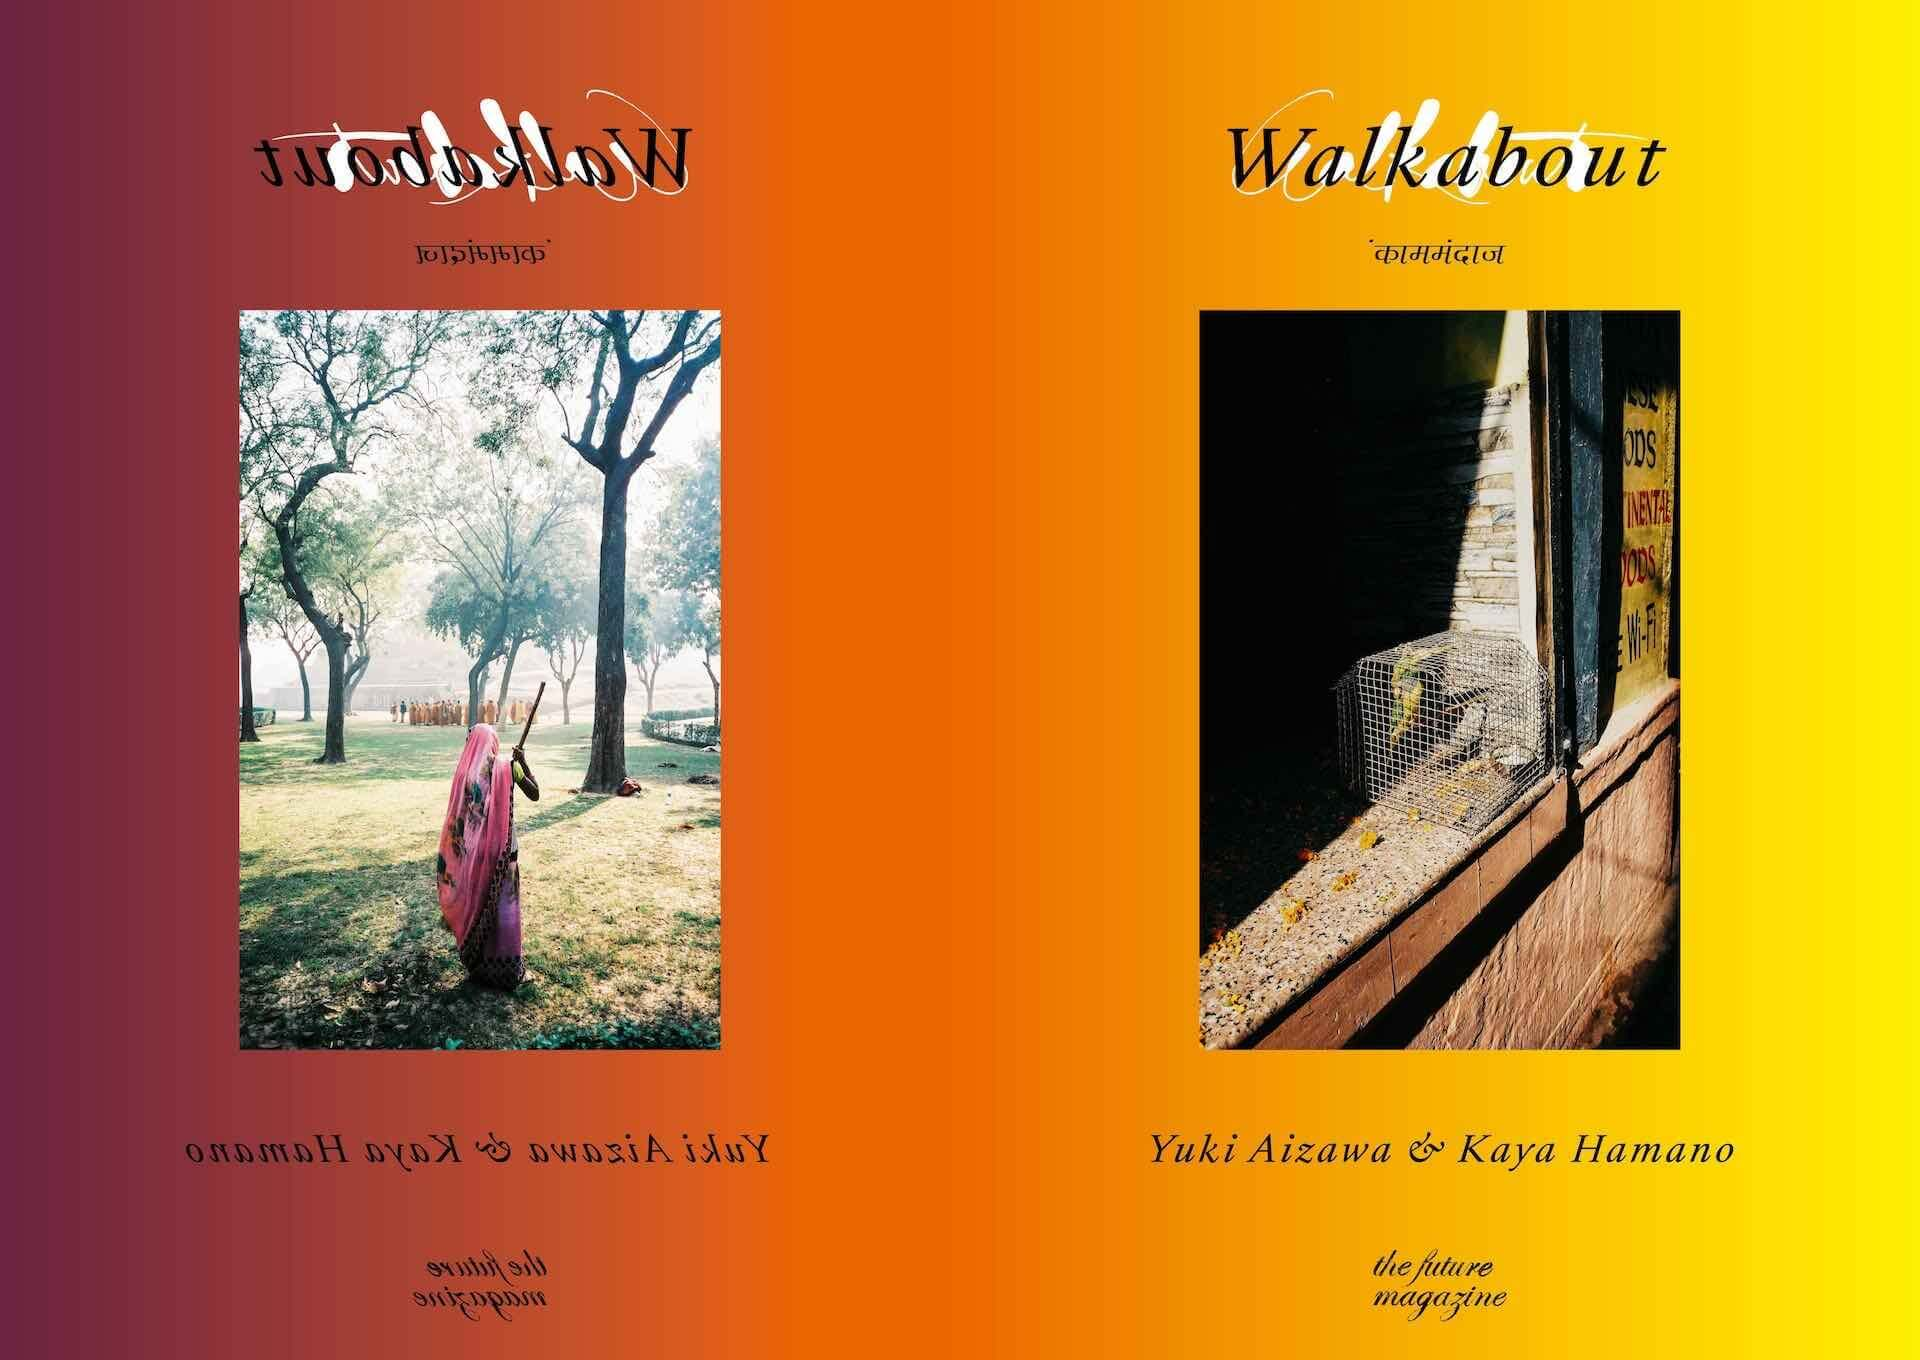 Gateballers ×写真家・相澤有紀、インド旅をまとめたドキュメンタリーブック創刊|Campfireでのプロジェクトがスタート art190723_gateballers_2-1920x1360